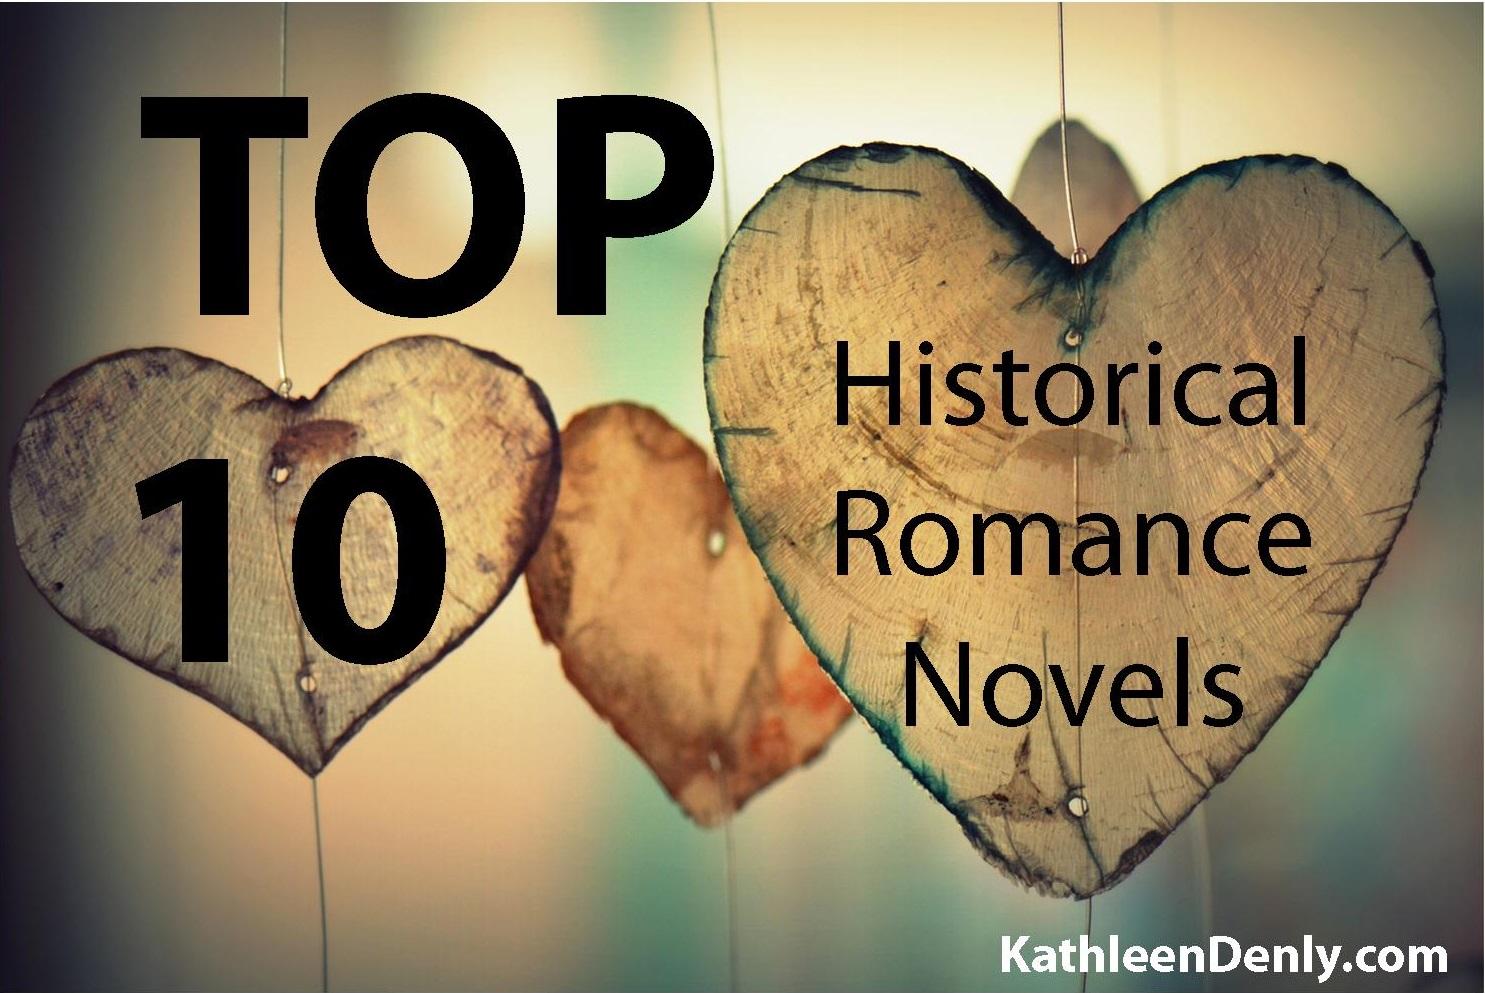 Top 10 Historical Romance Novels KathleenDenly.com